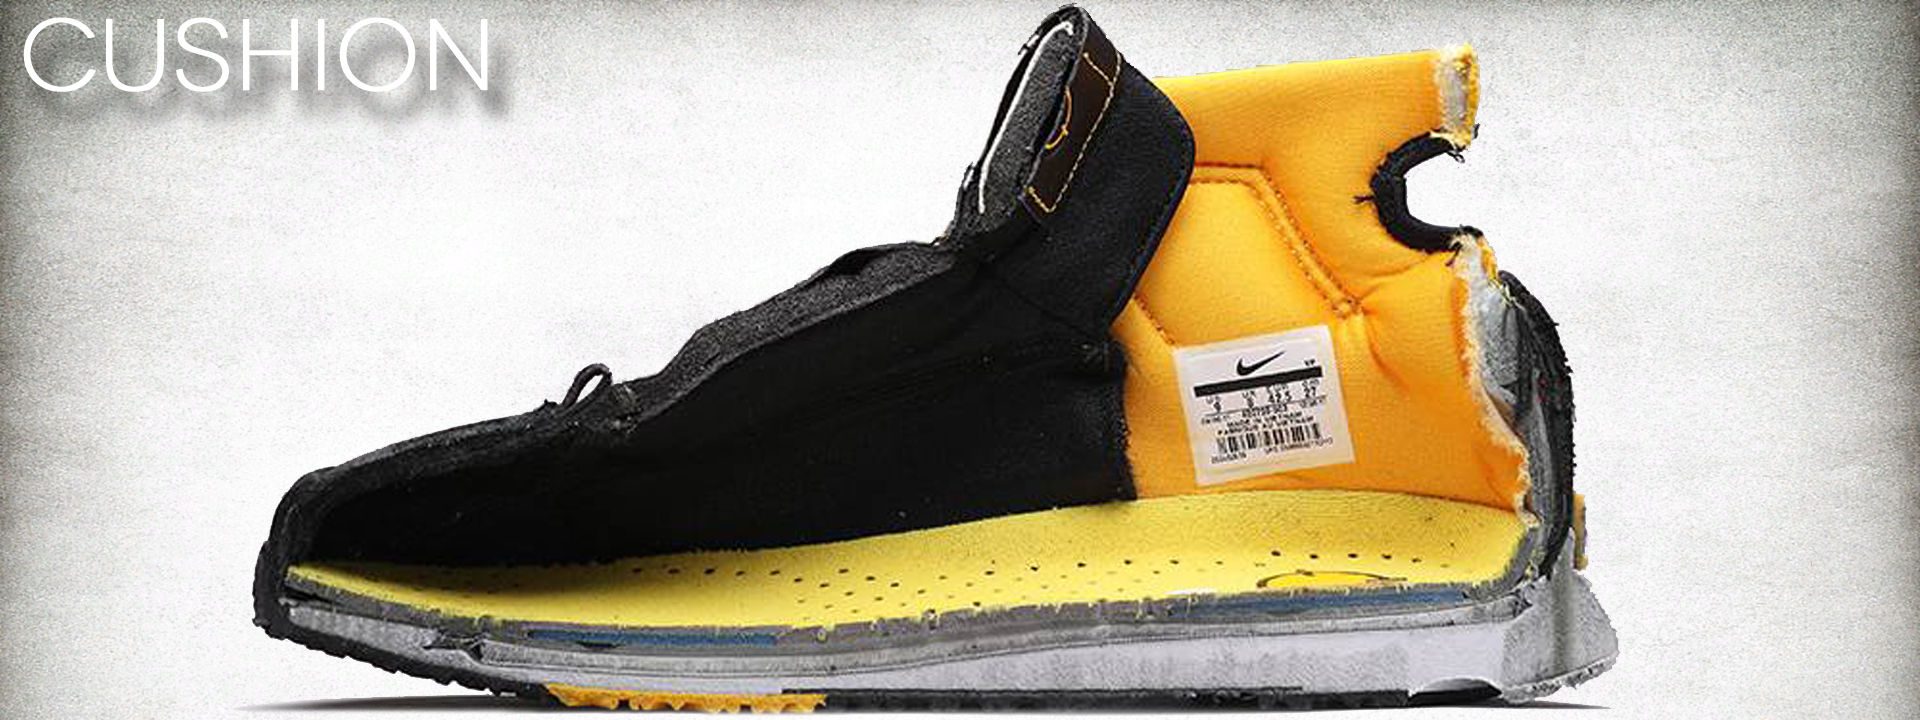 Nike Air Zoom Kobe 1 Nike Air Zoom Kobe 1 Forums  f5da5361f